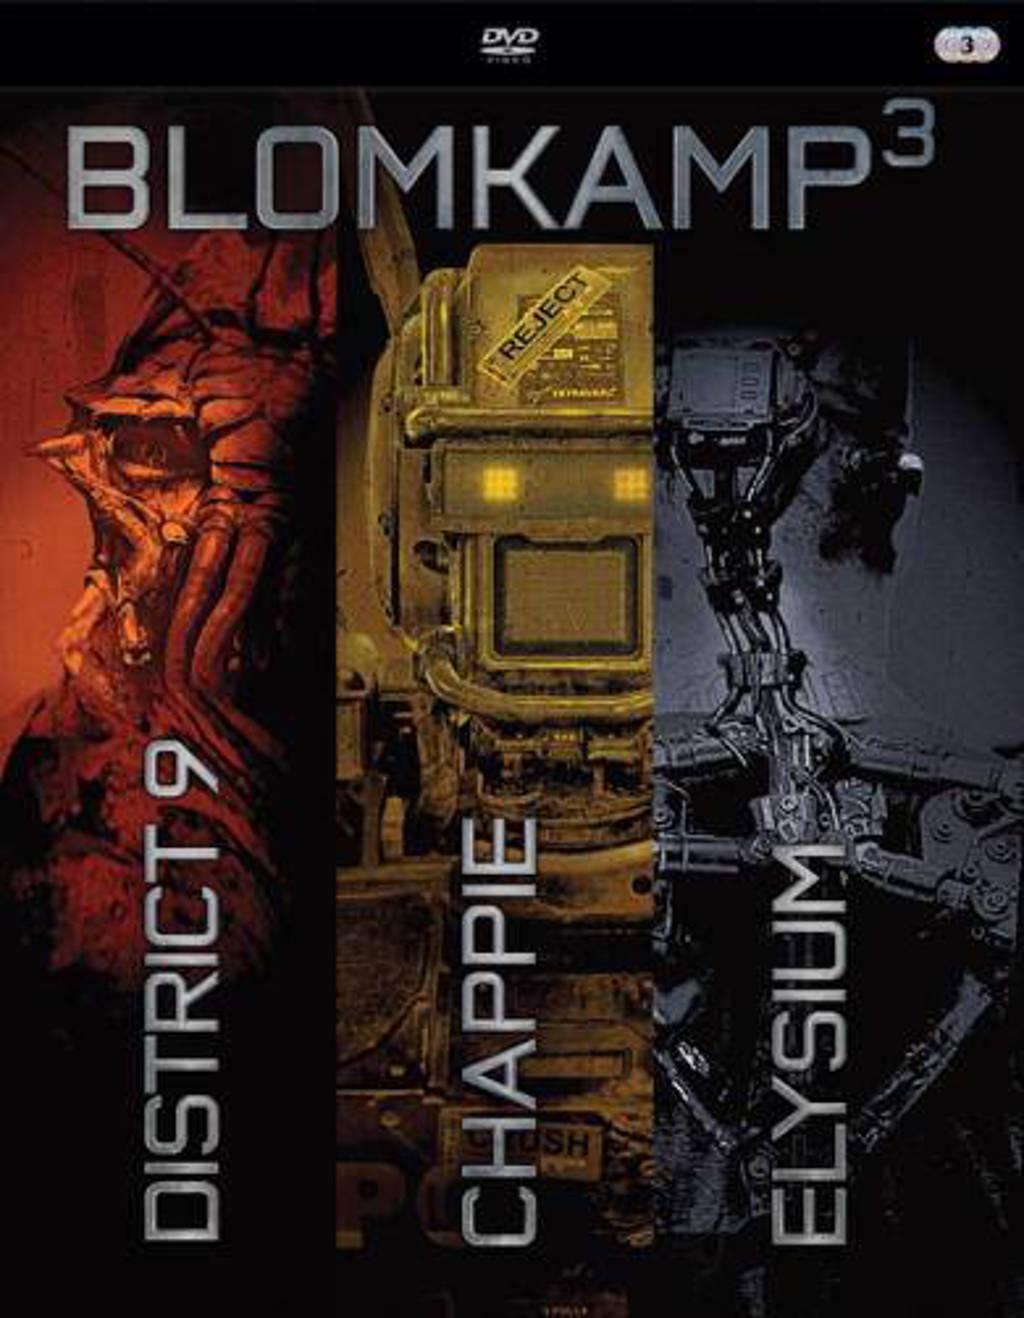 Chappie/District 9/Elysium (DVD)